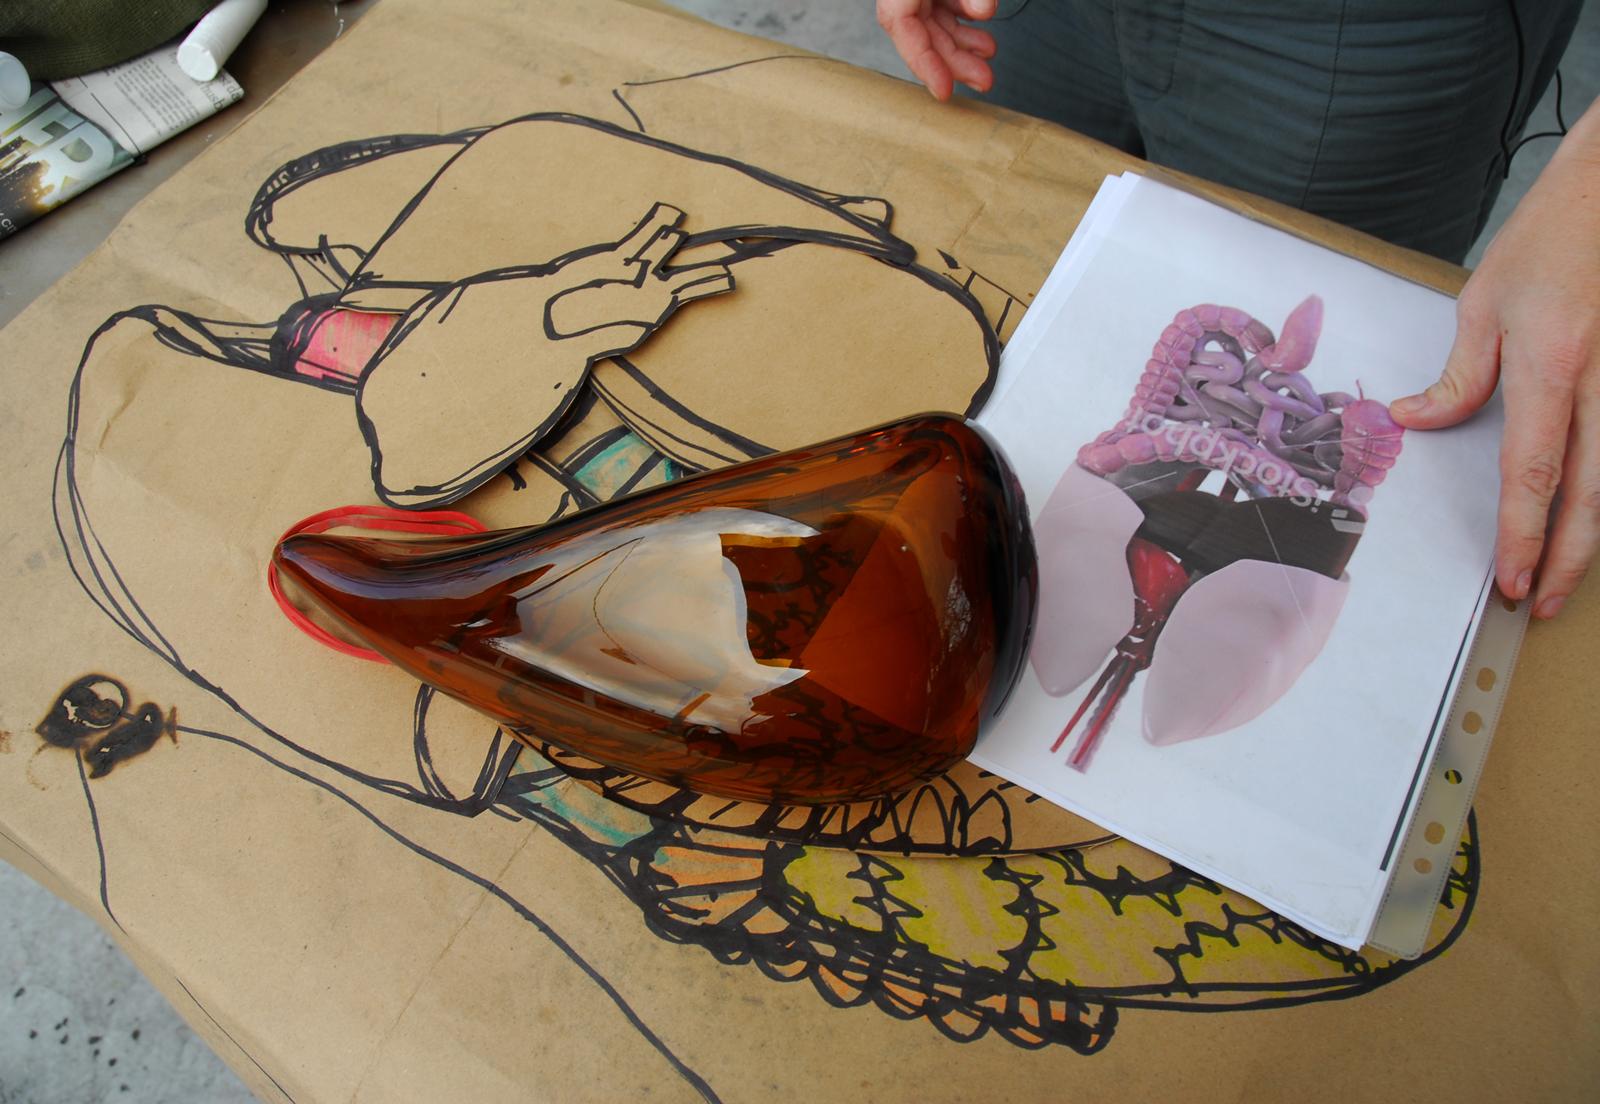 Prototype by designer Sigga Heimis at GlassLab